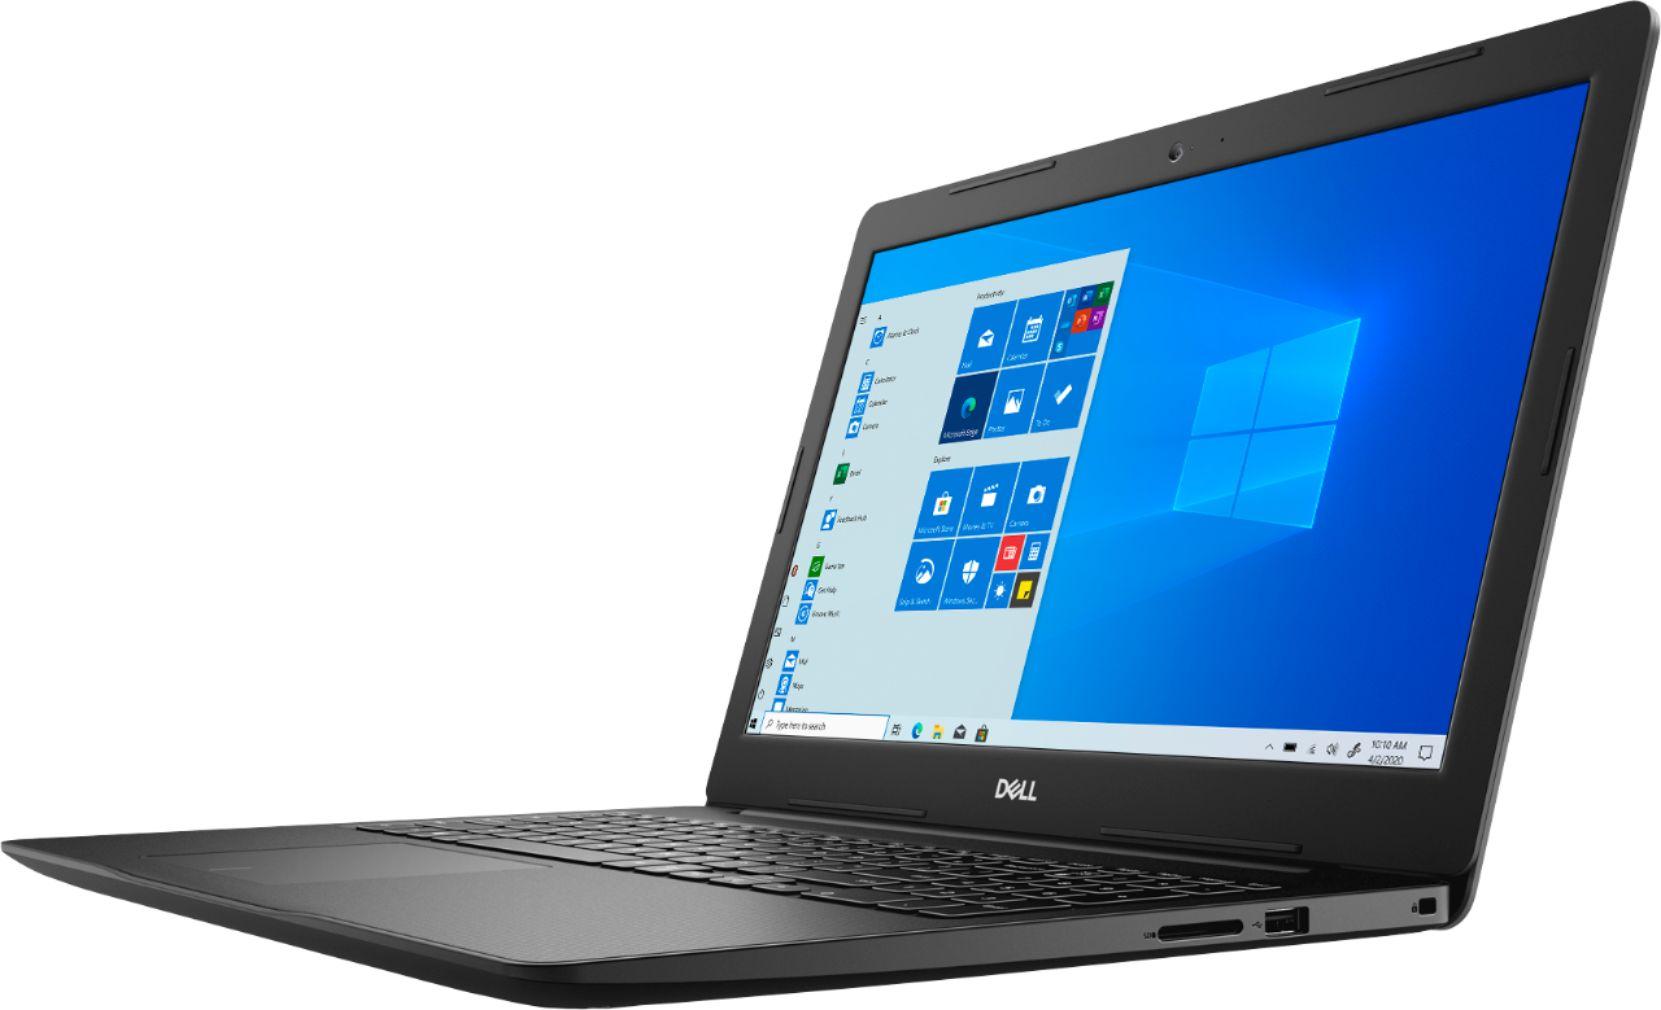 Dell Inspiron 15 3593 i5 1TB 8GB RAM